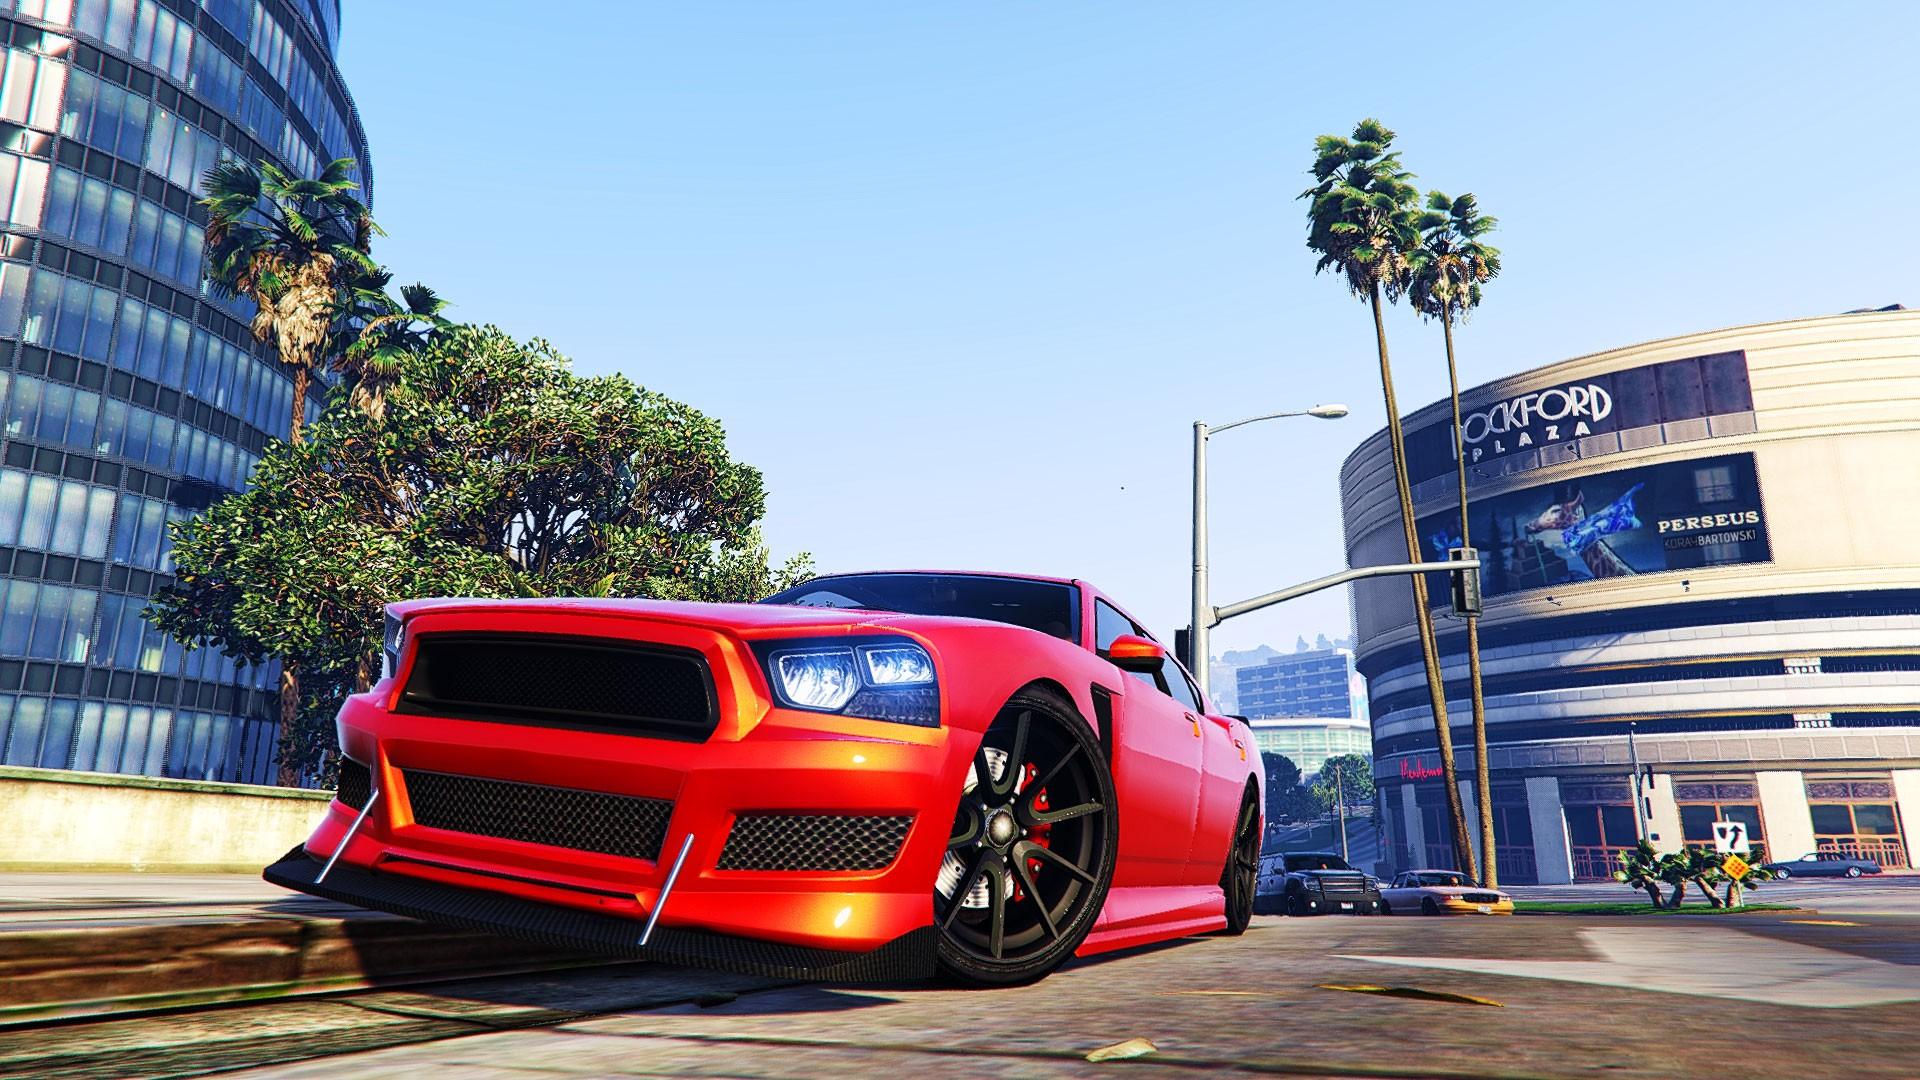 Wallpaper : video games, building, Grand Theft Auto V